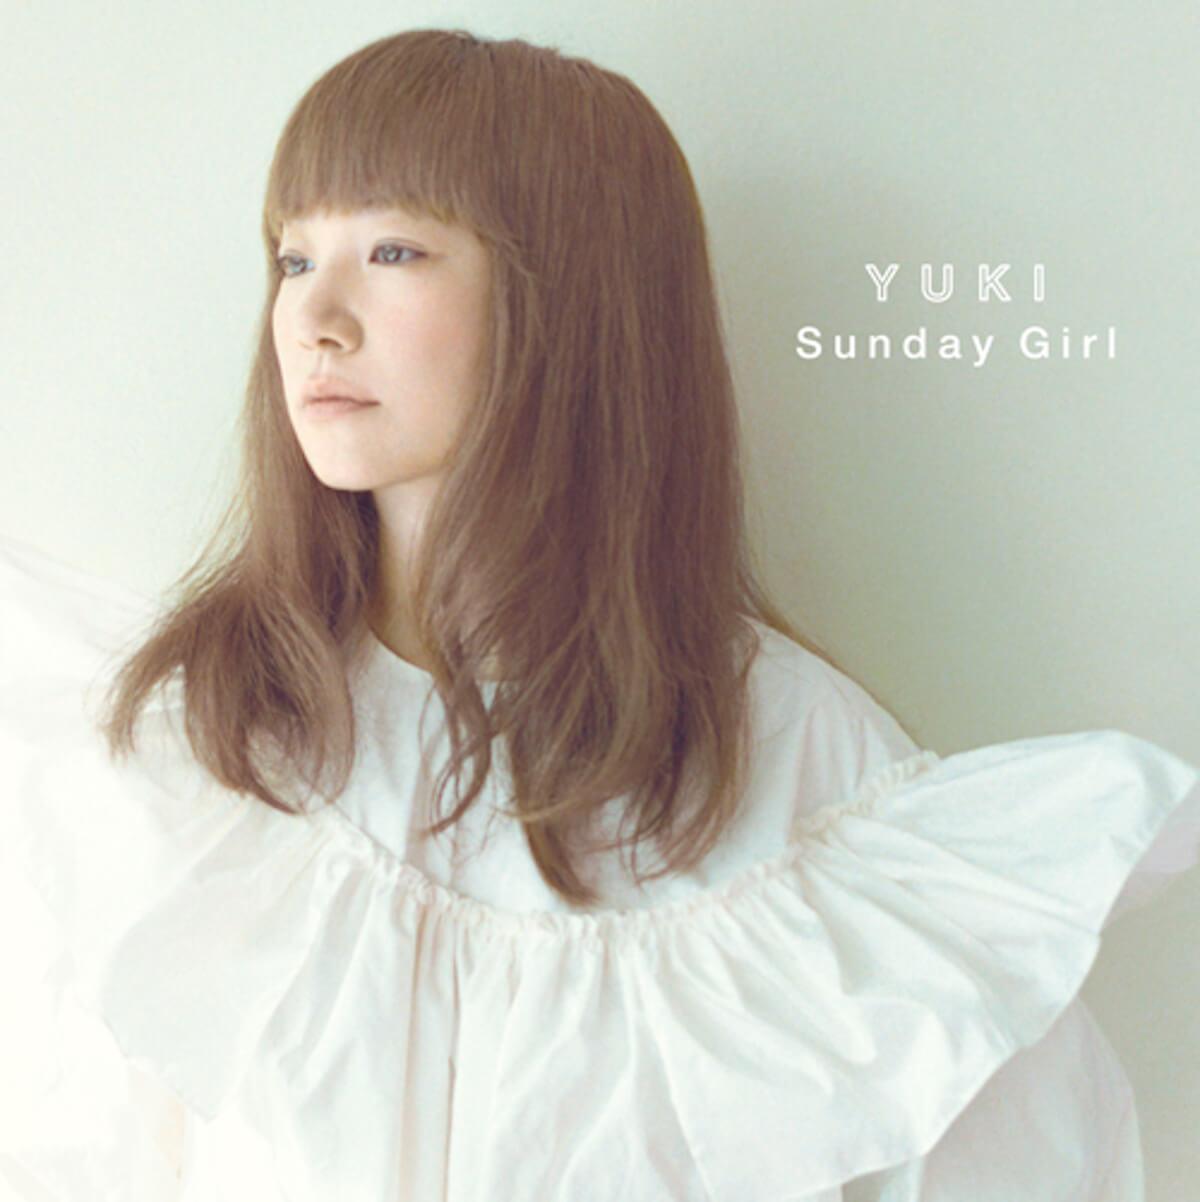 YUKI、最新アルバム収録曲『Sunday Girl』をアナログEPでリリース決定|作曲・編曲・プロデュースは細野晴臣が担当 music190510_yuki_main